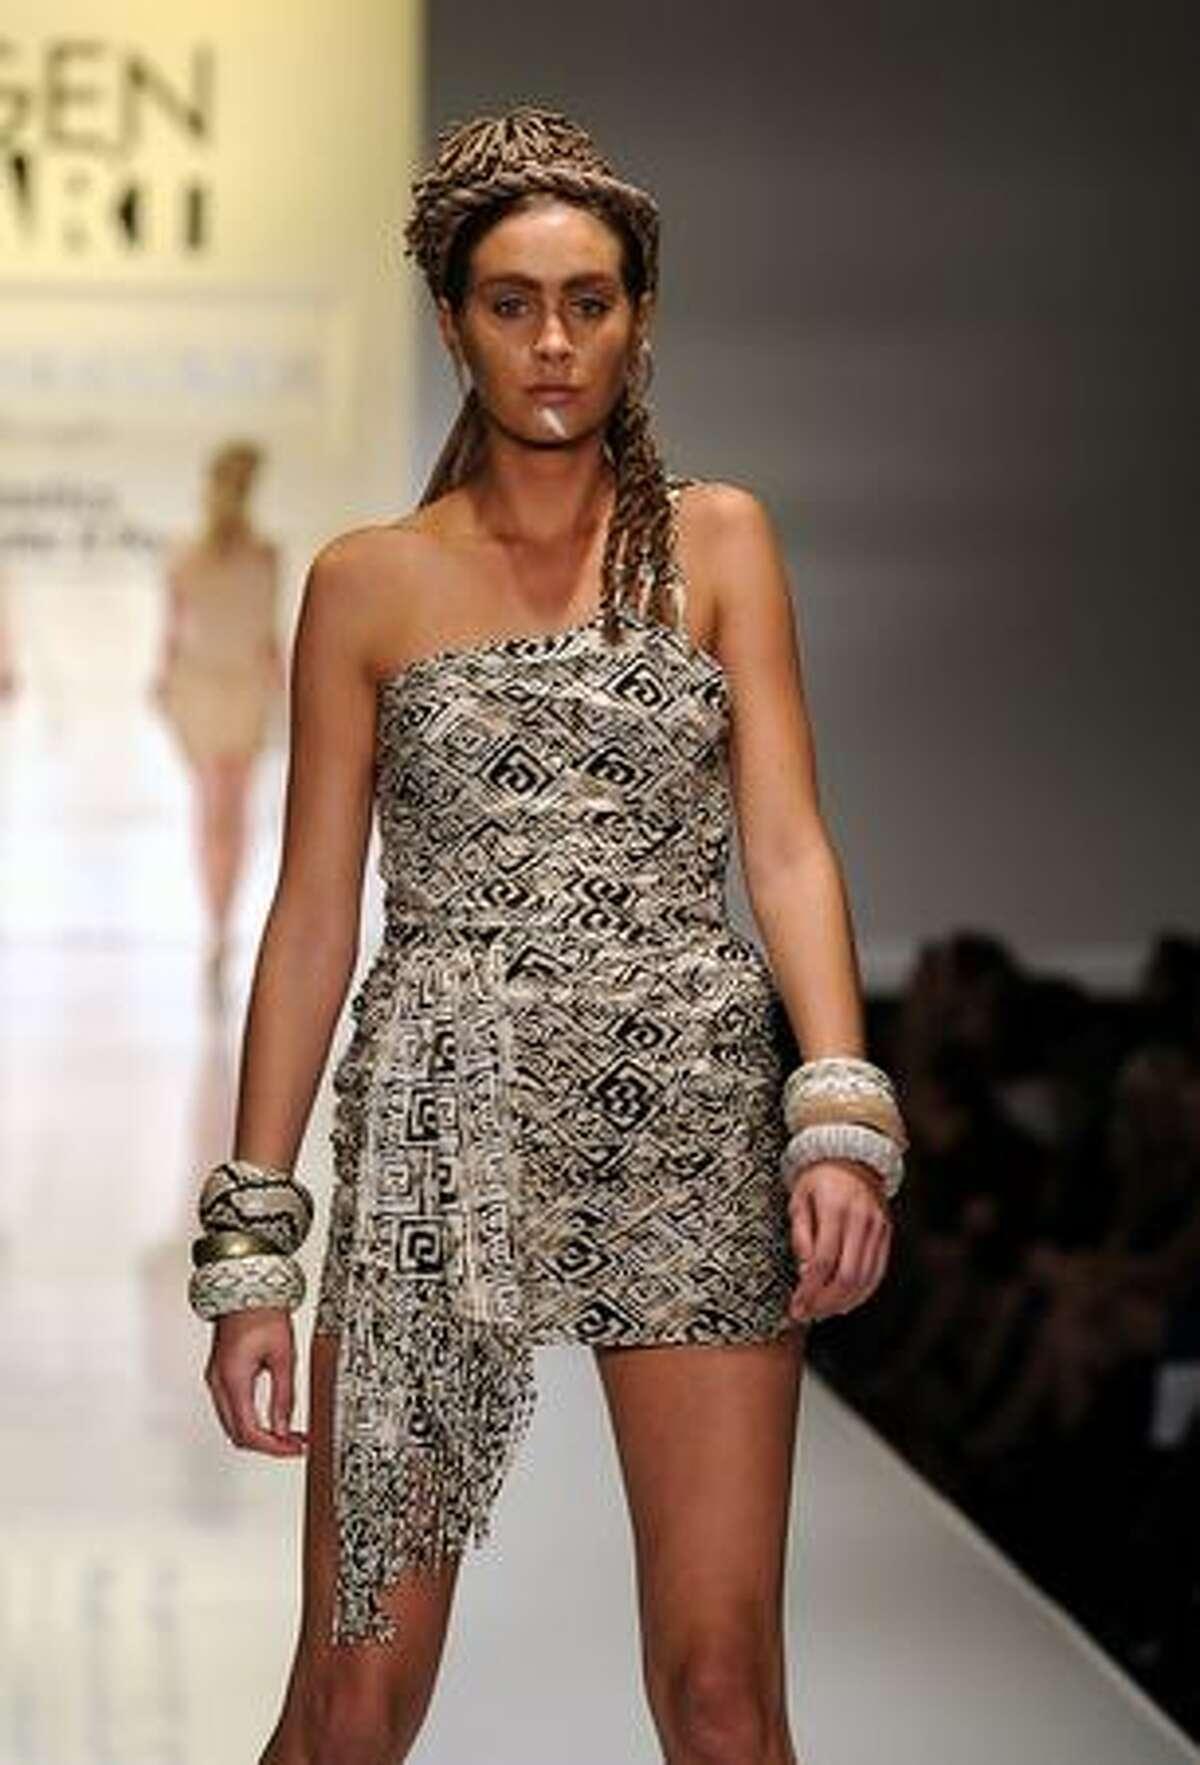 A model wears leyendecker on the runway at Gen Art's 12th Annual